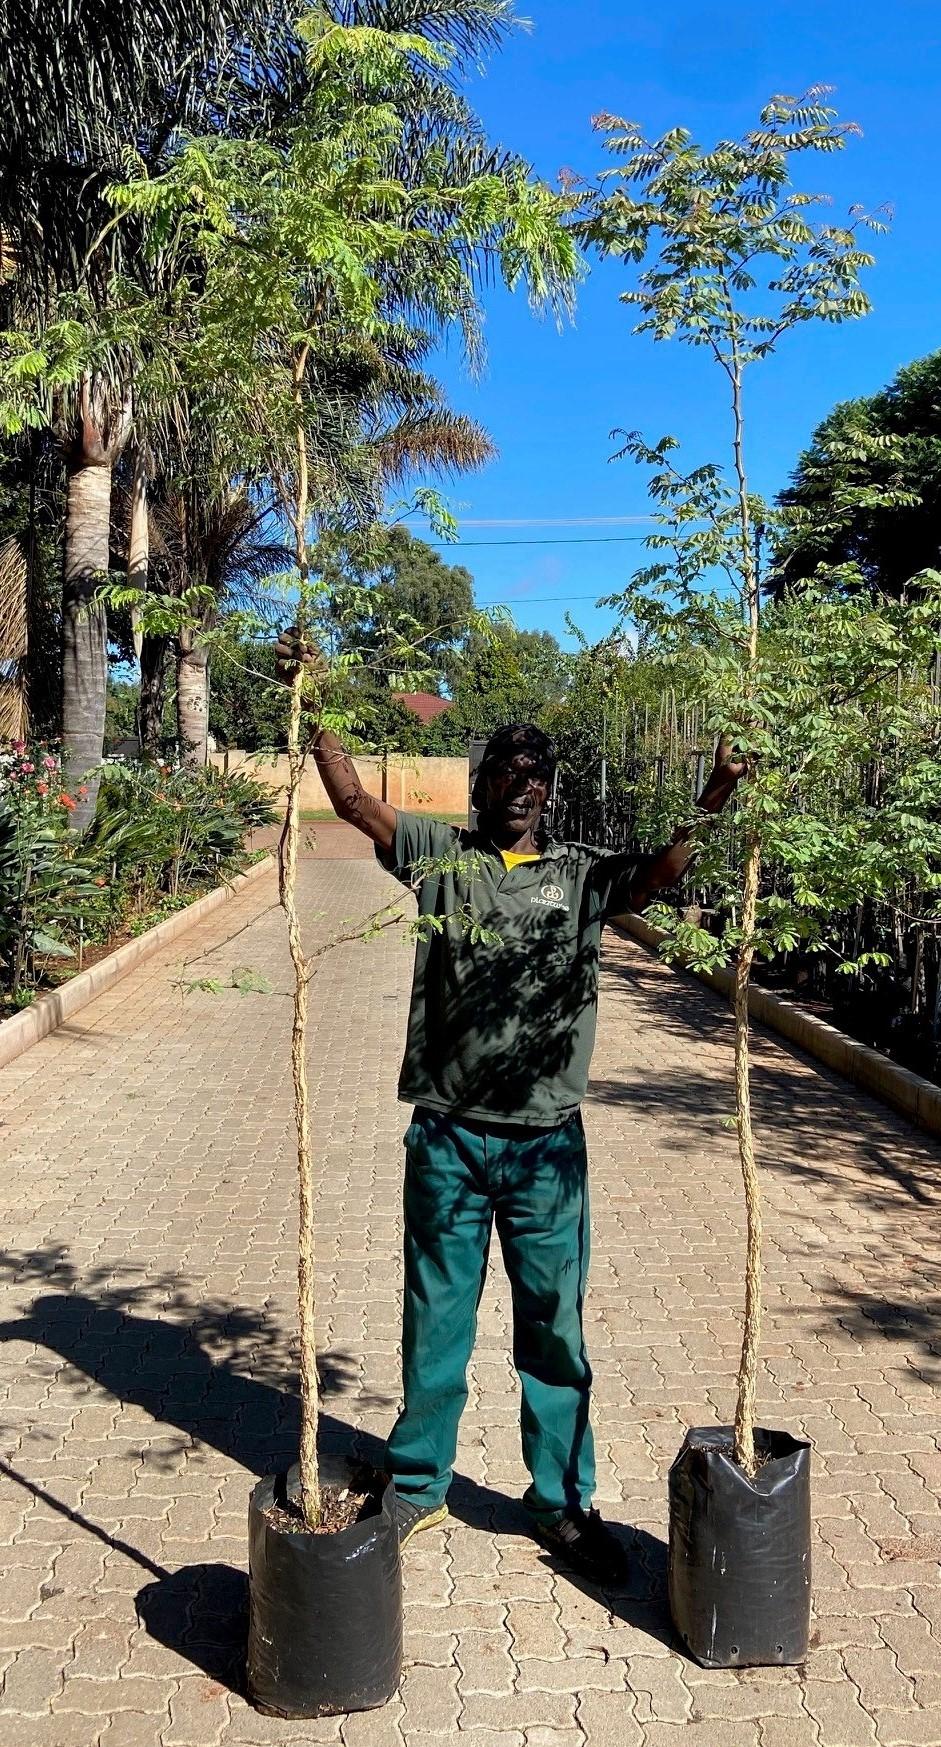 Monkey thorn trees